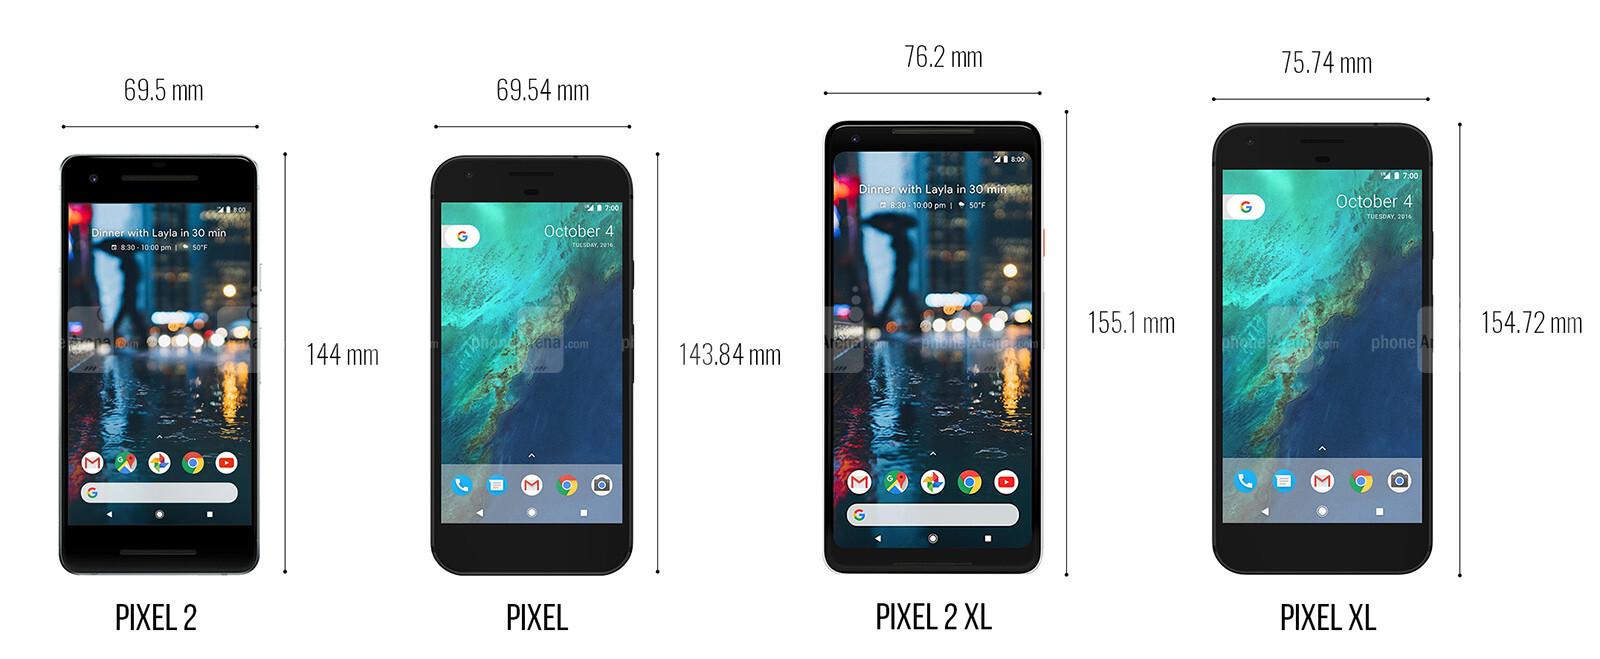 Iphone X Note 8 Pixel 2 Galaxy S8 Lg V30 Duvar: Google Pixel 2 And Pixel 2 XL Size Comparison